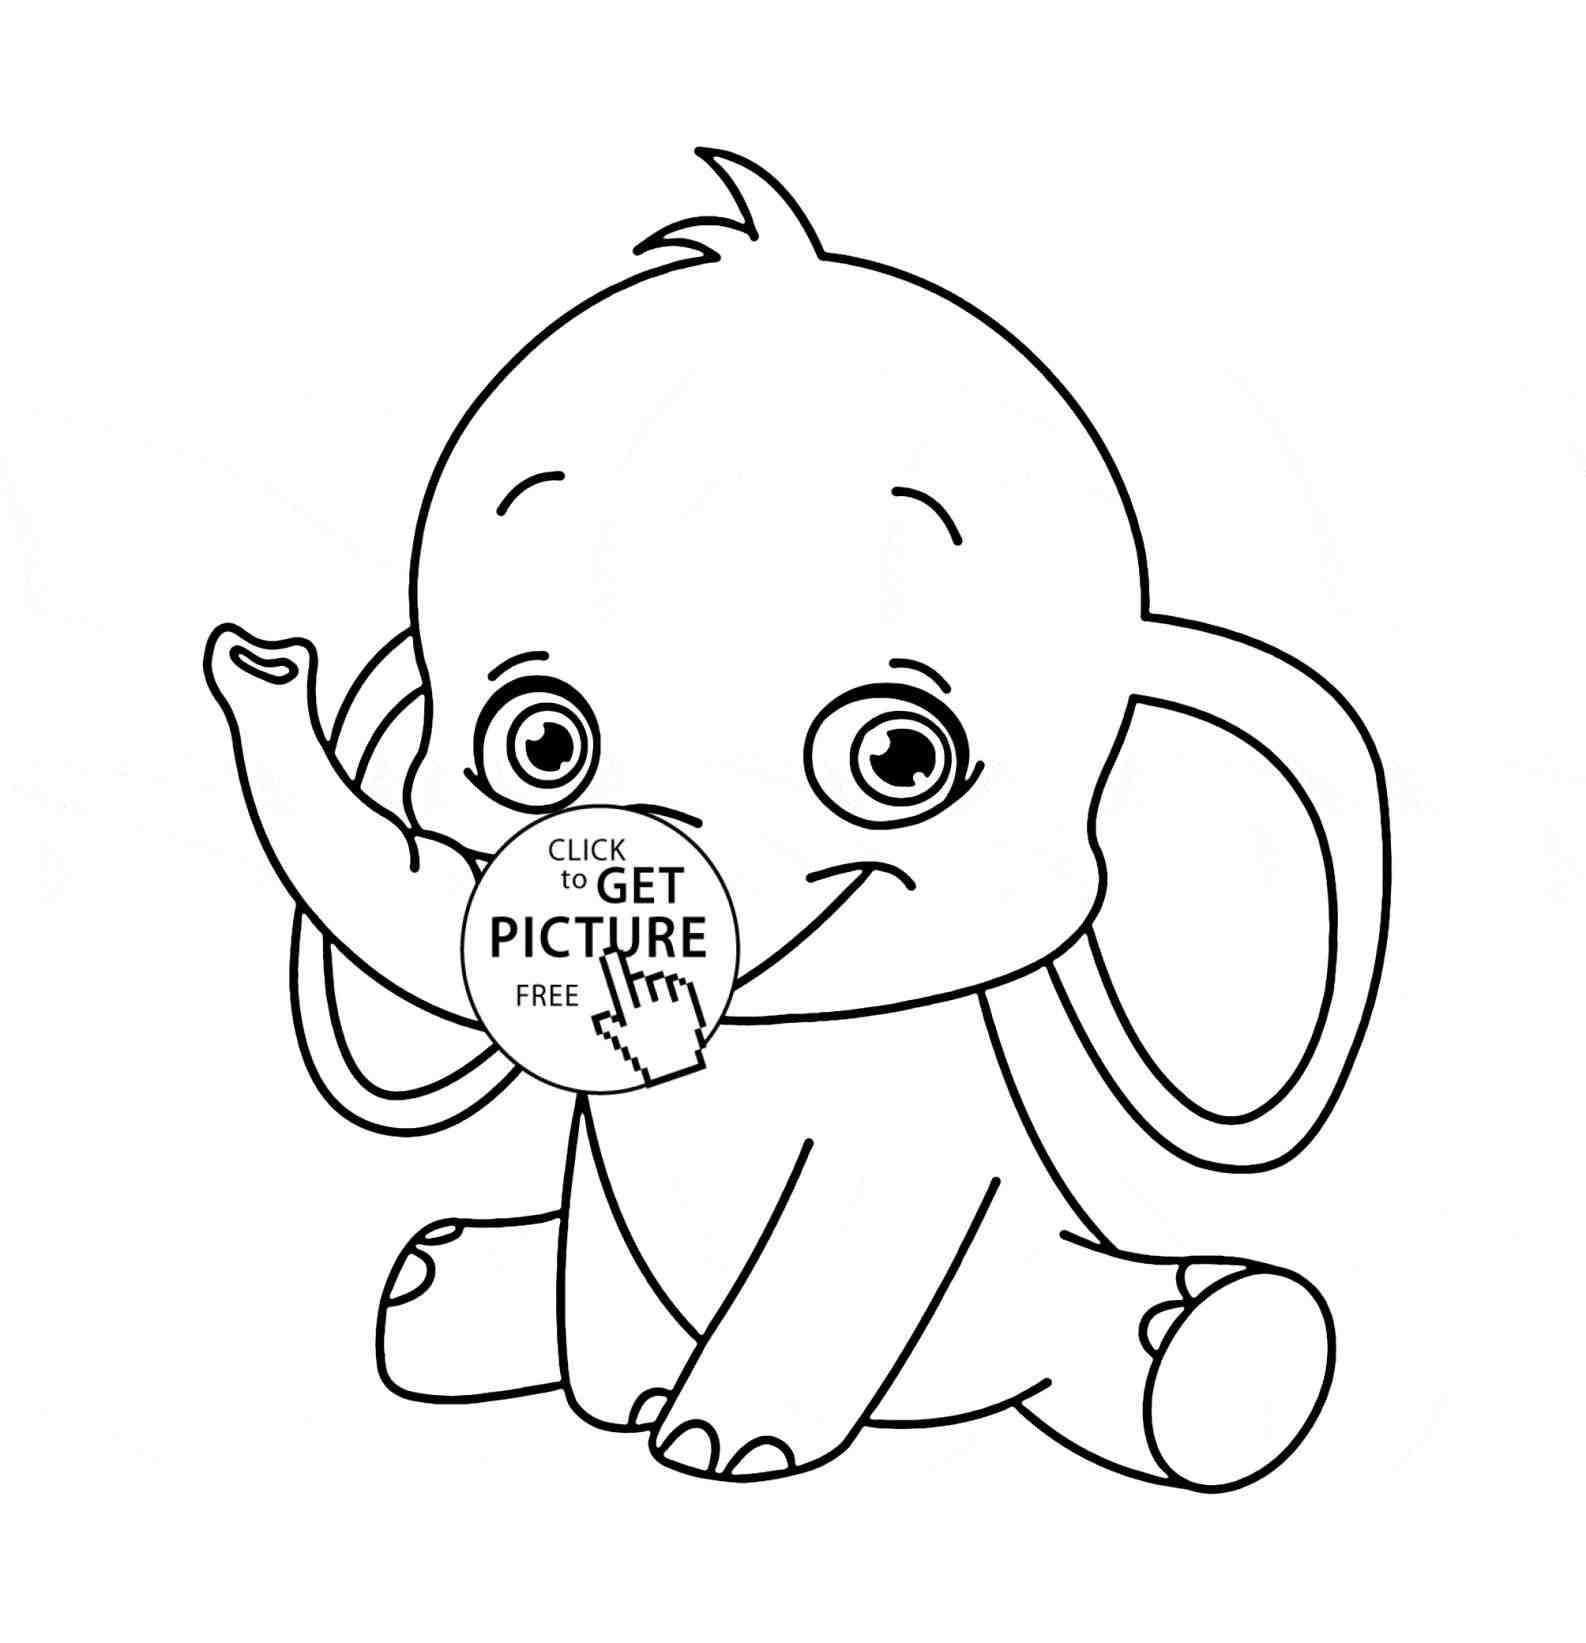 1586x1643 Cute Animal Drawings In Color